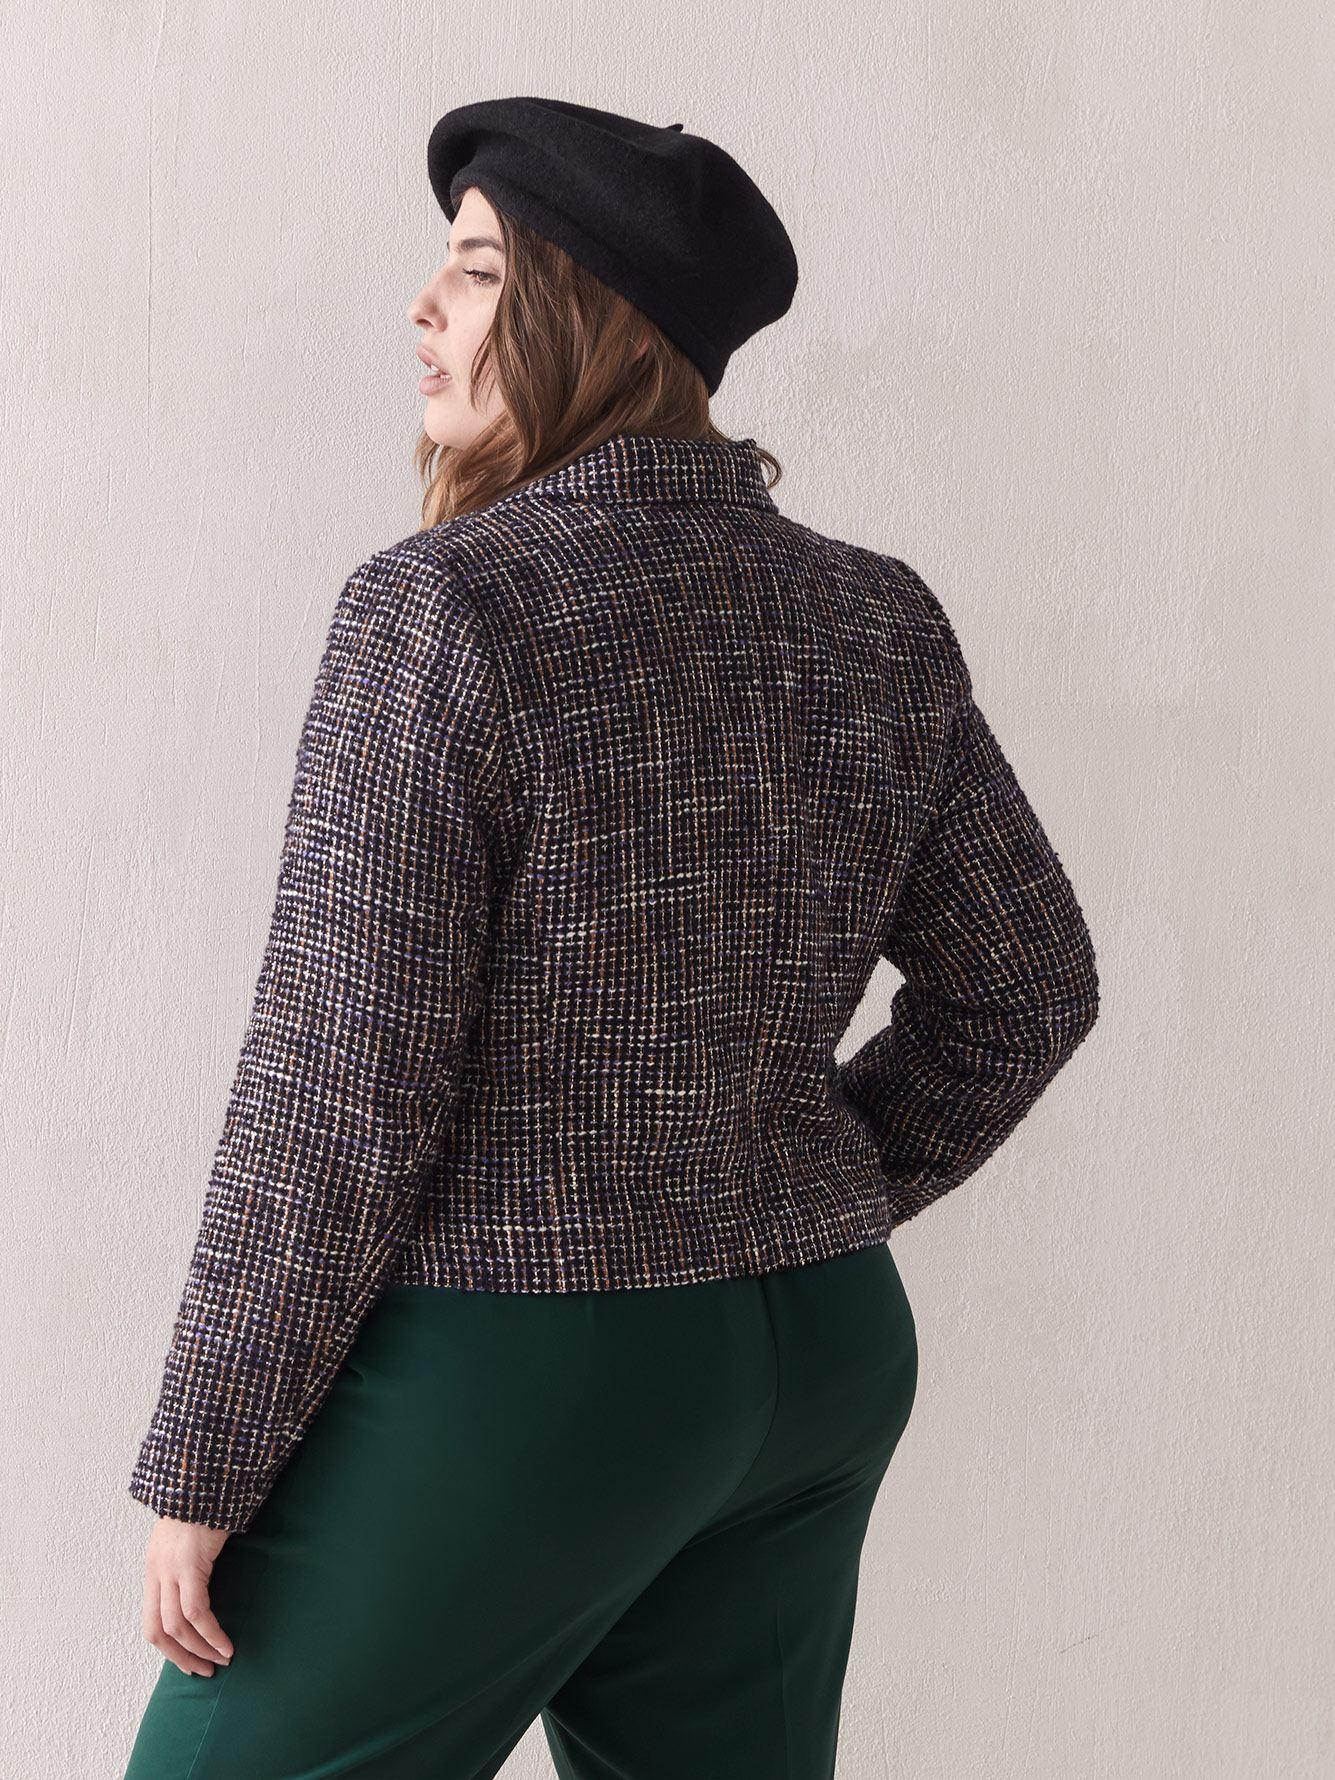 Veste moto en tweed bouclé - Addition Elle